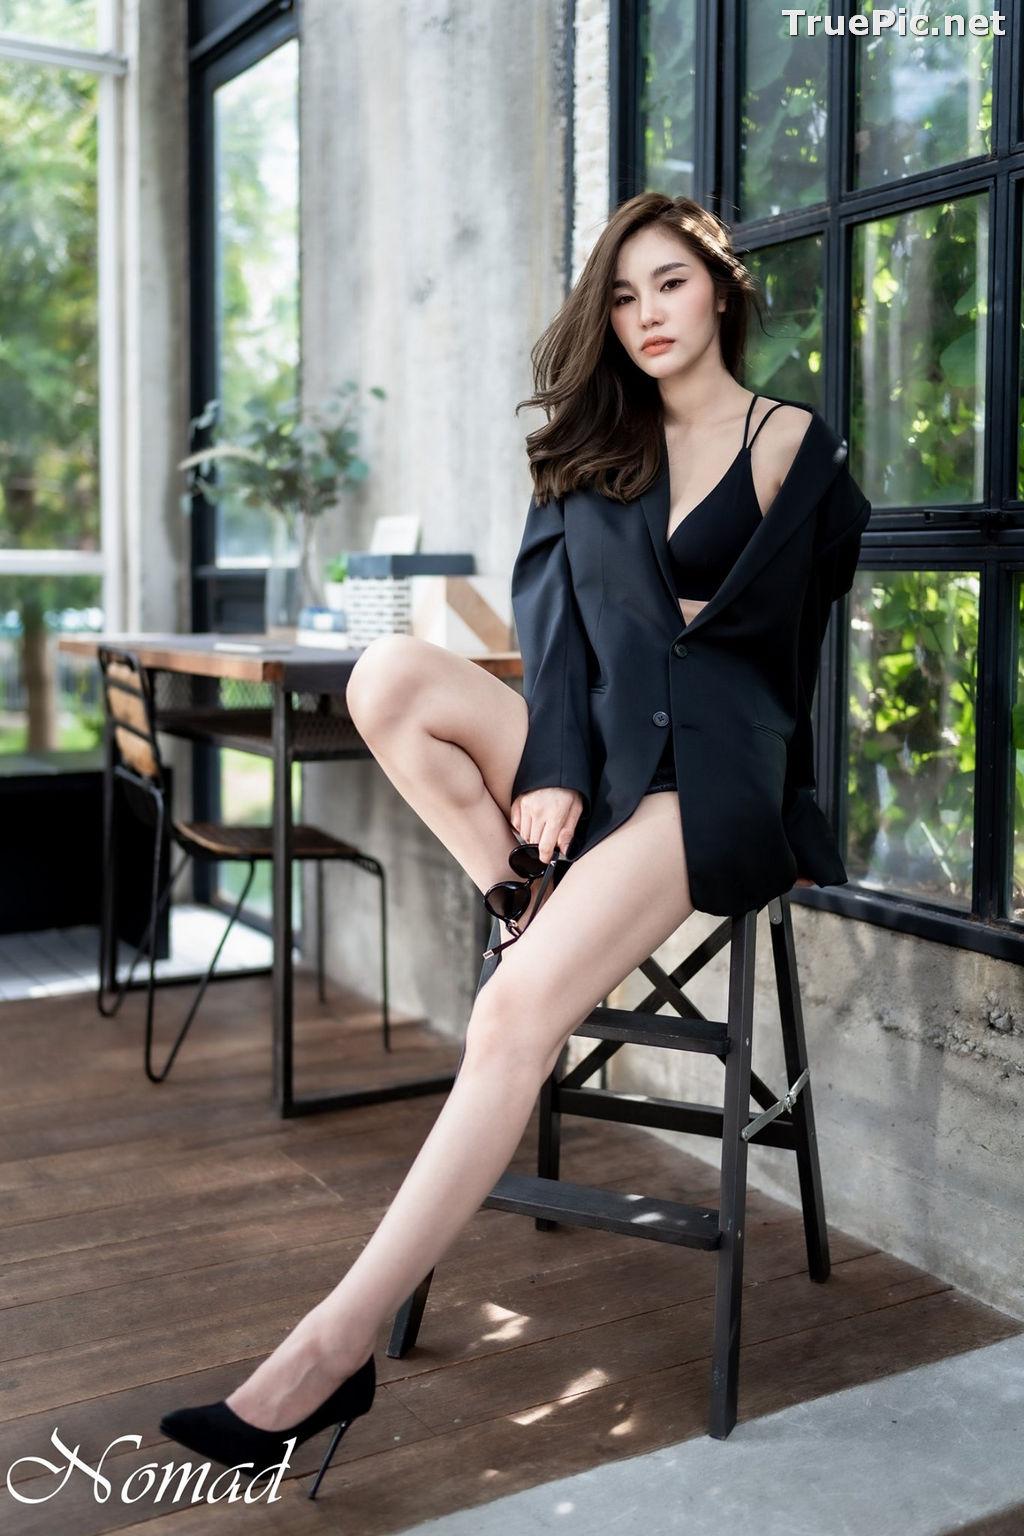 Image Thailand Model - Jarunan Tavepanya - Beautiful In Black and White - TruePic.net - Picture-2